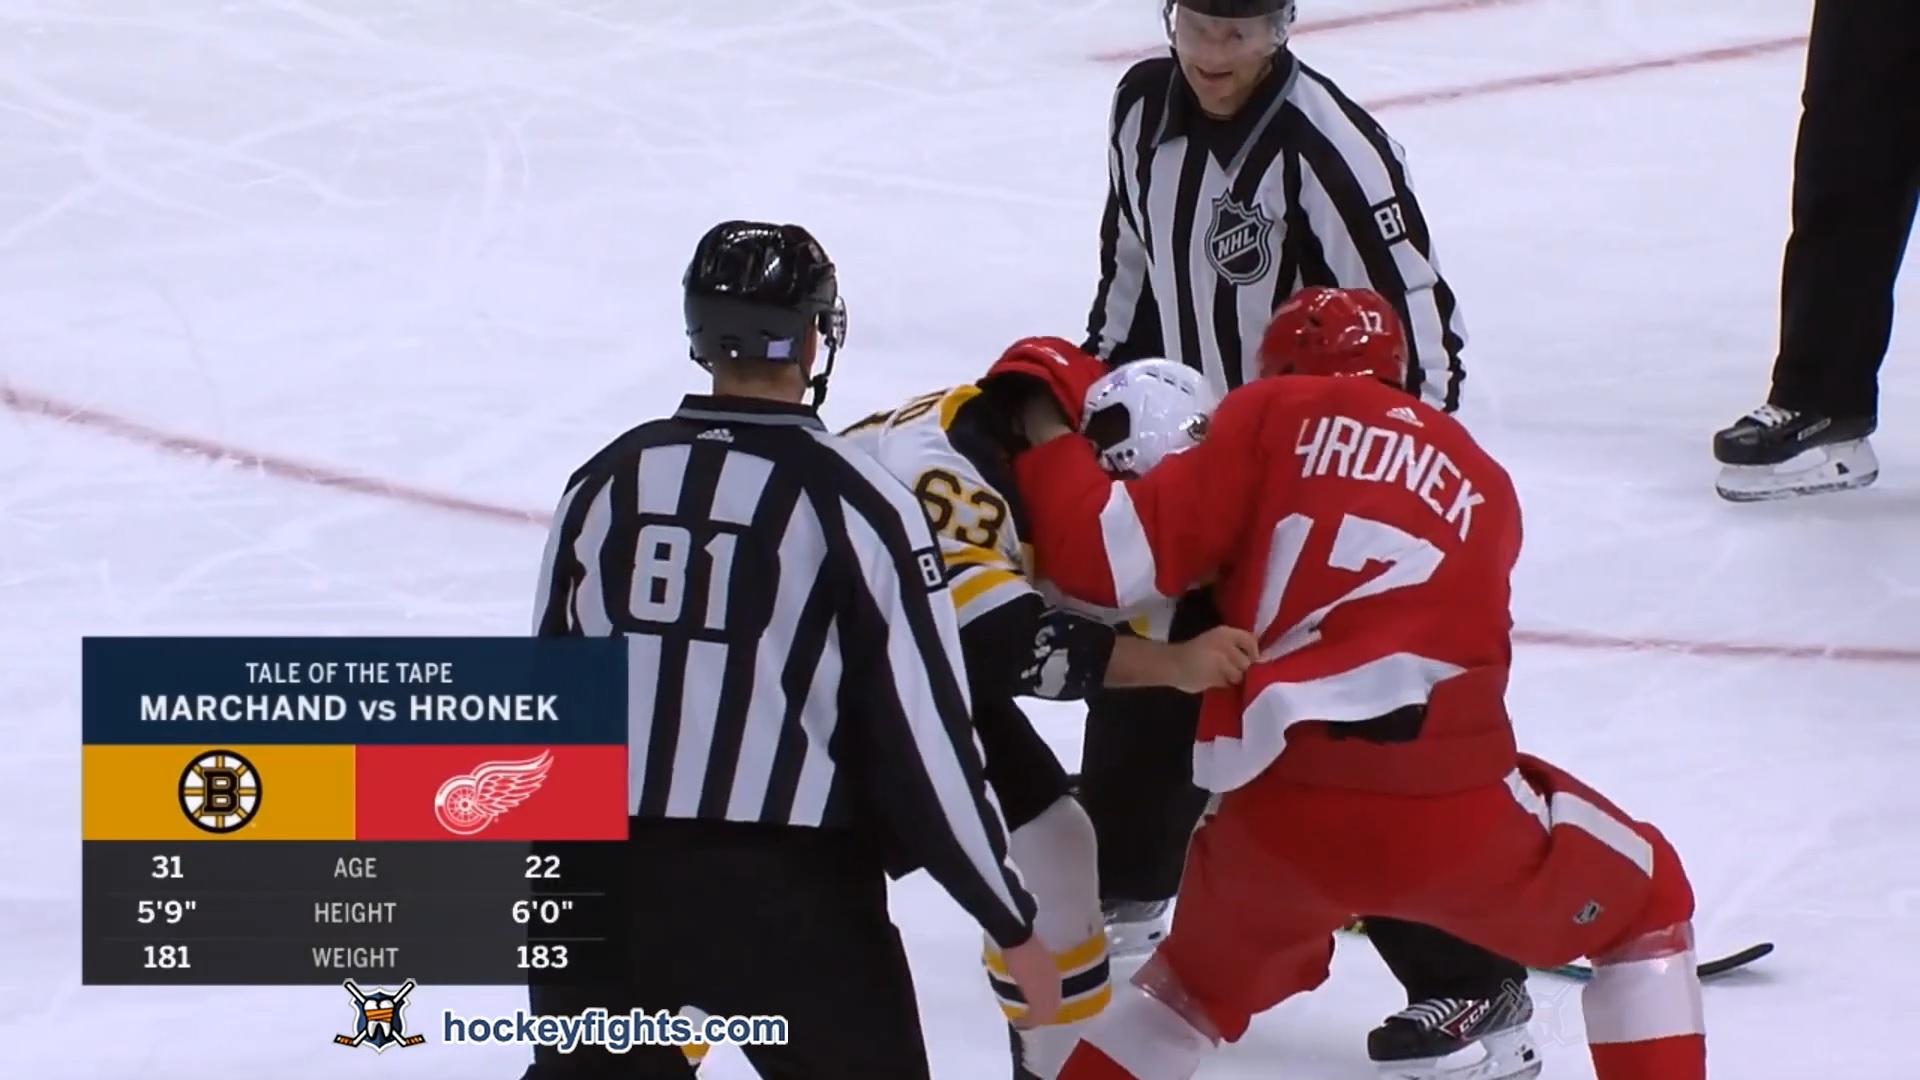 Filip Hronek vs. Brad Marchand